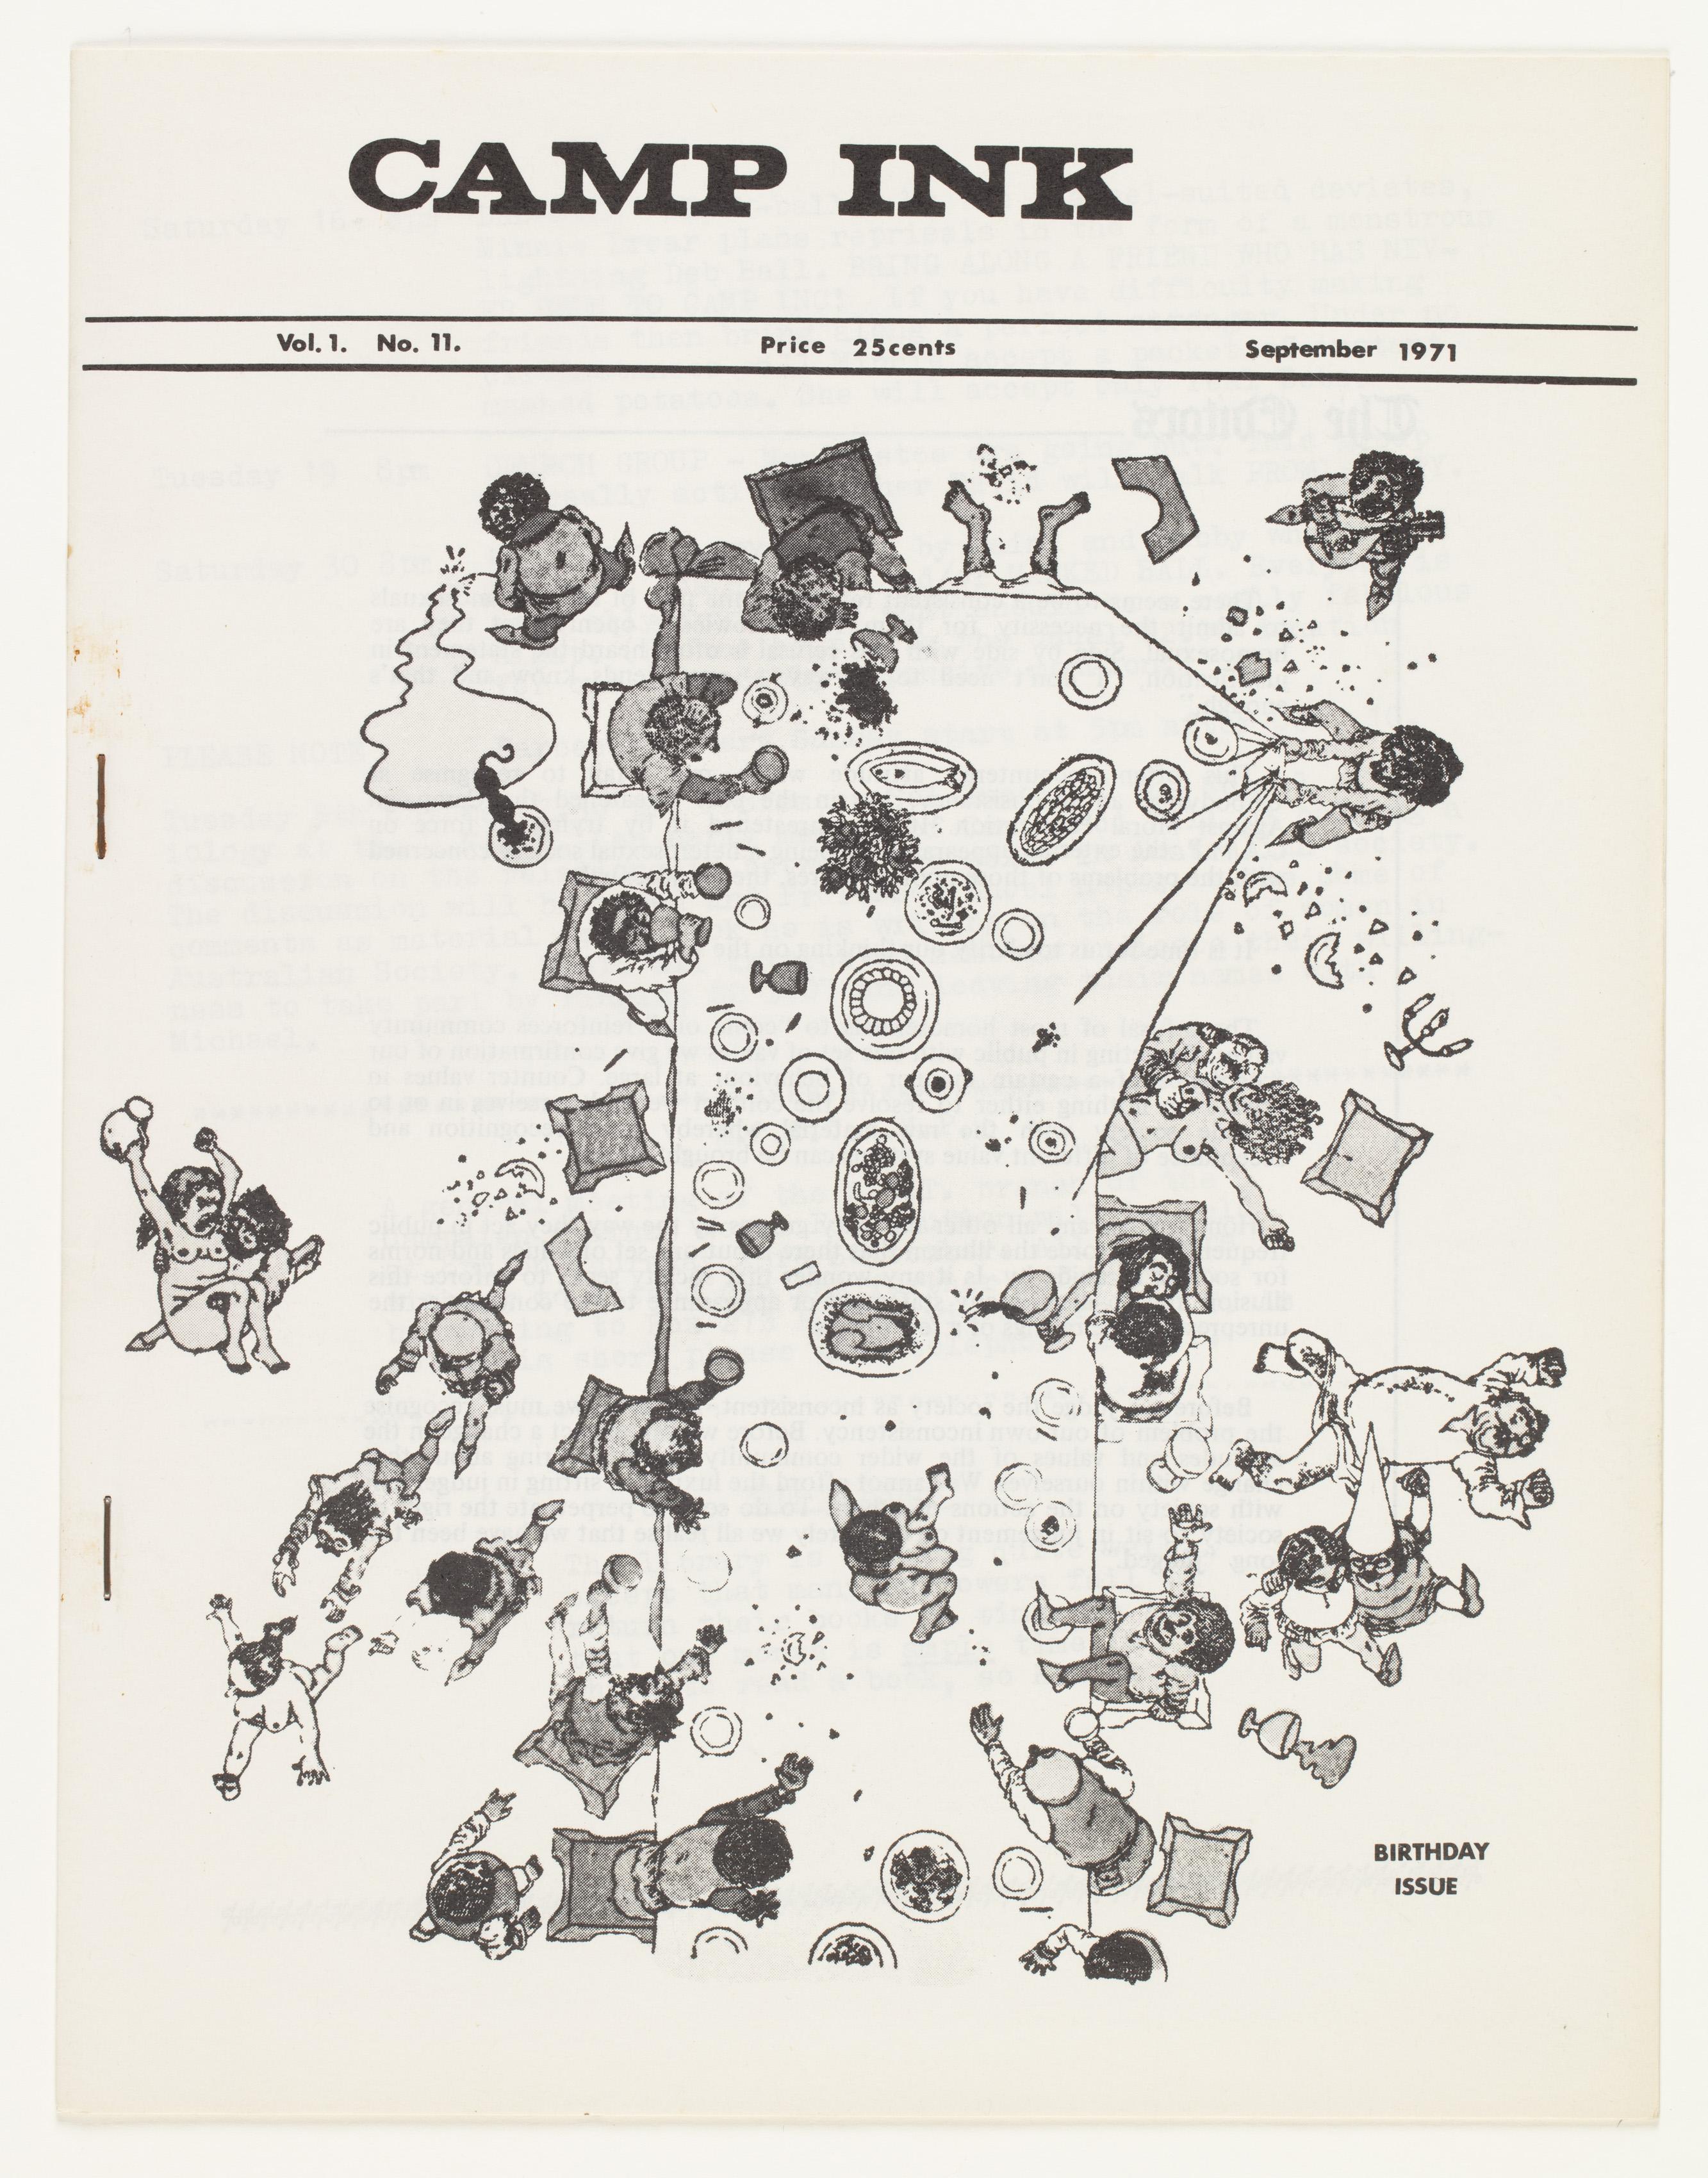 Camp Ink. Vol. 1, No.11 (September 1971)